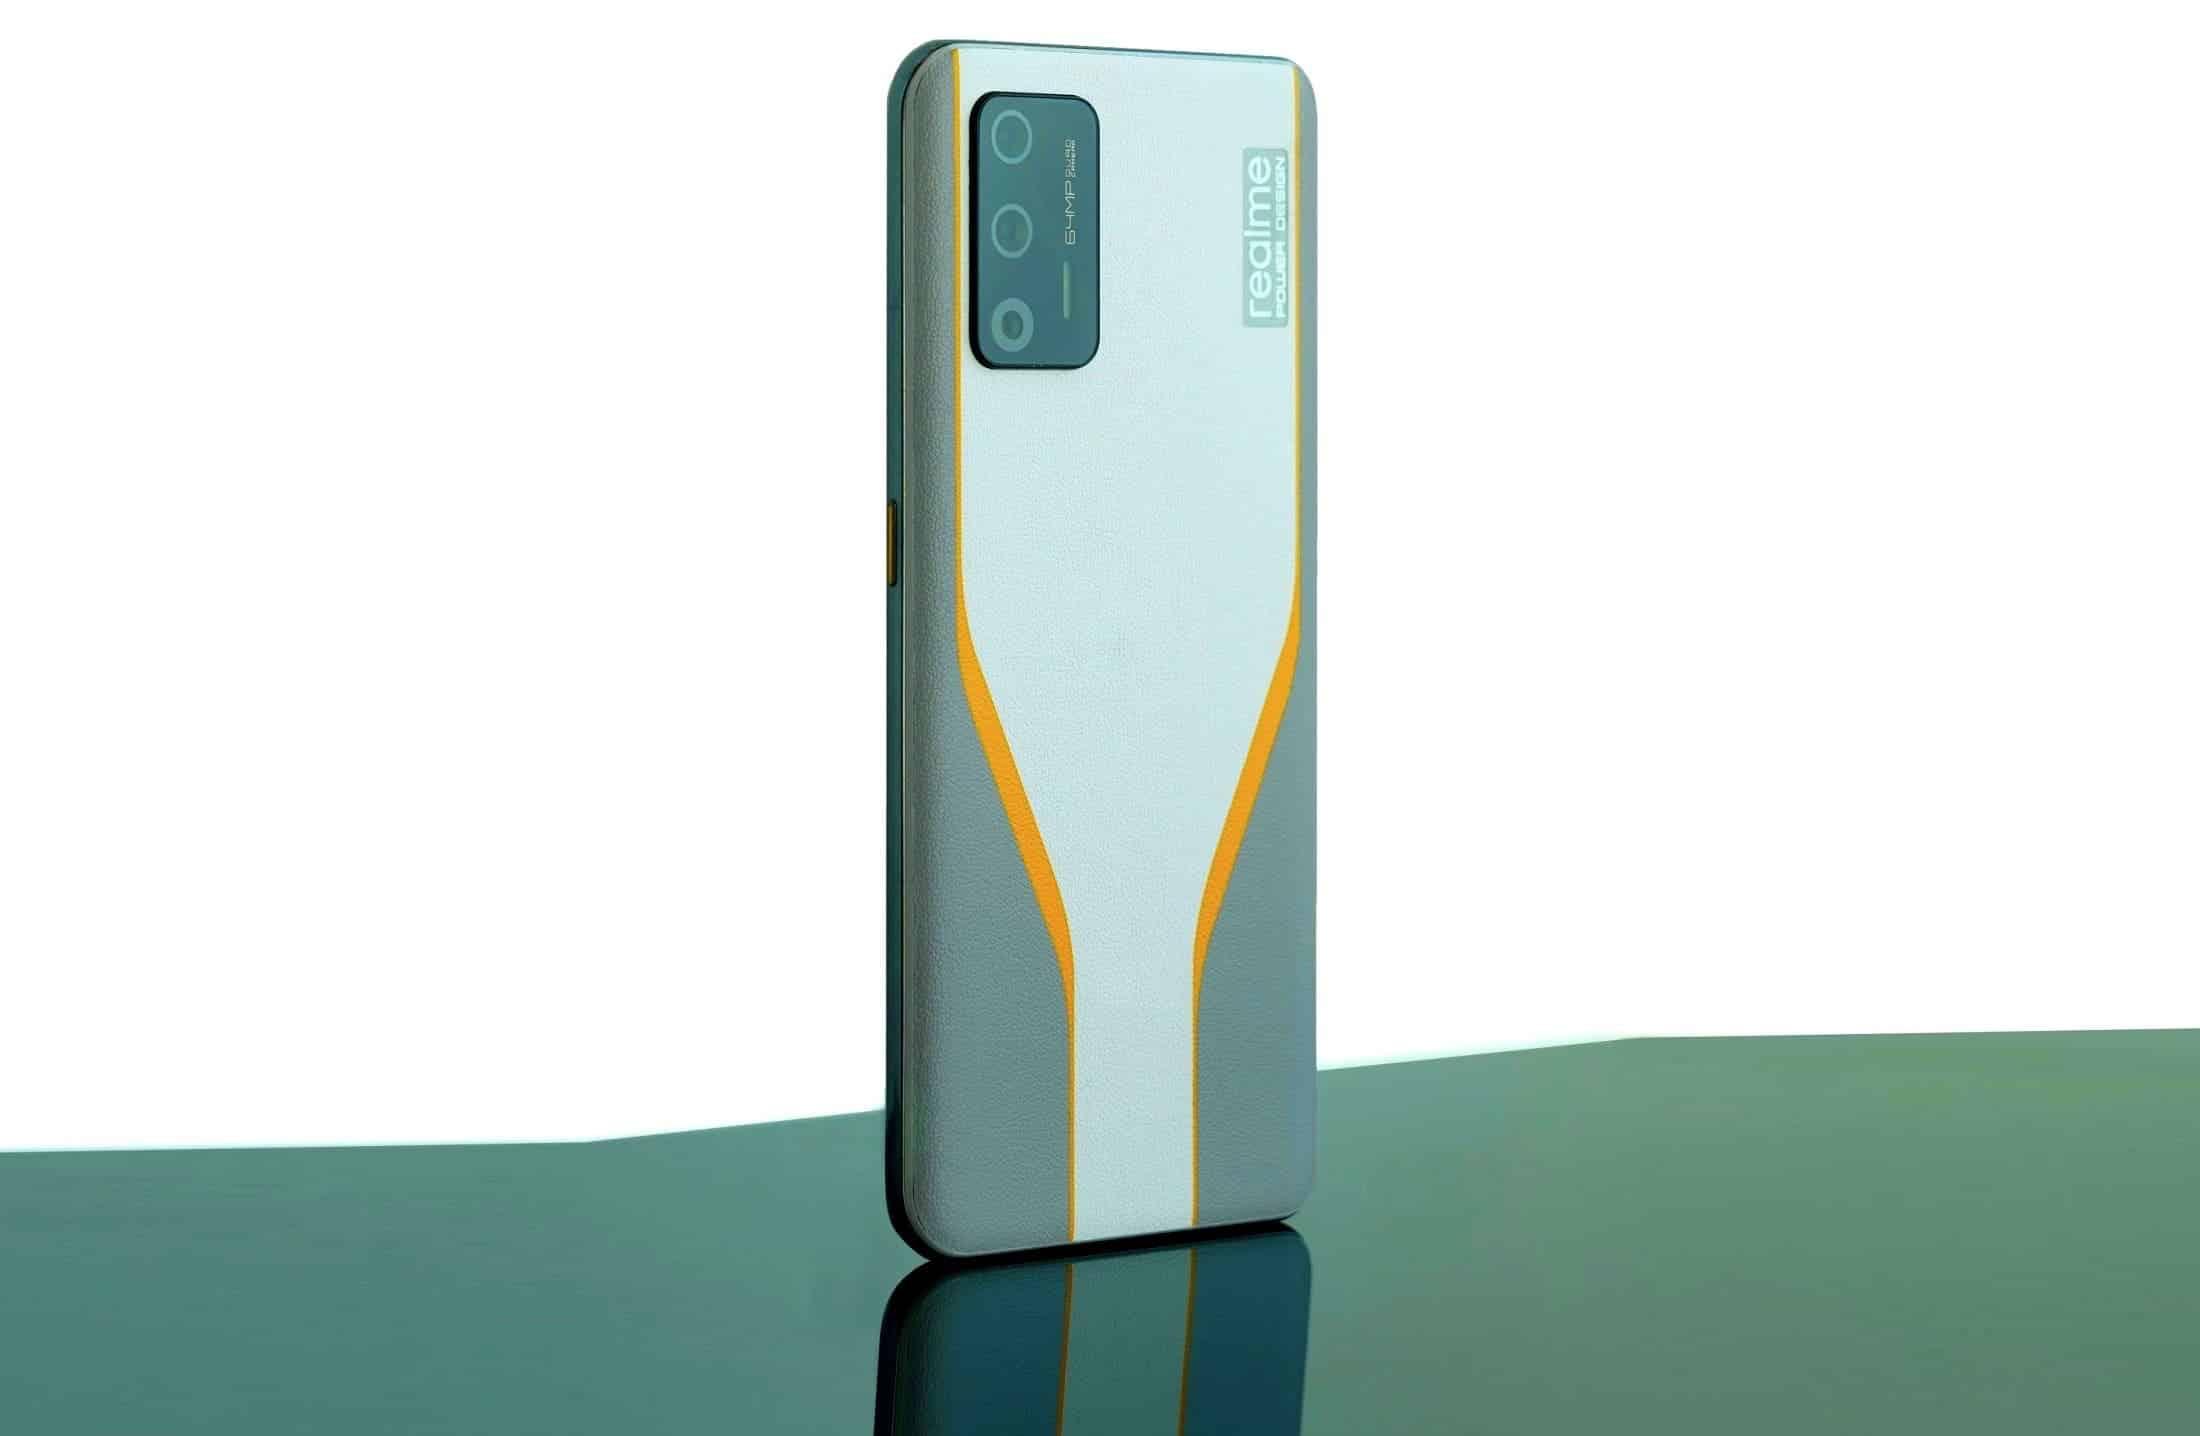 Официально: флагман Realme GT (aka Realme Race) с чипом Snapdragon 888 и 125-ваттной зарядкой представят 4 марта